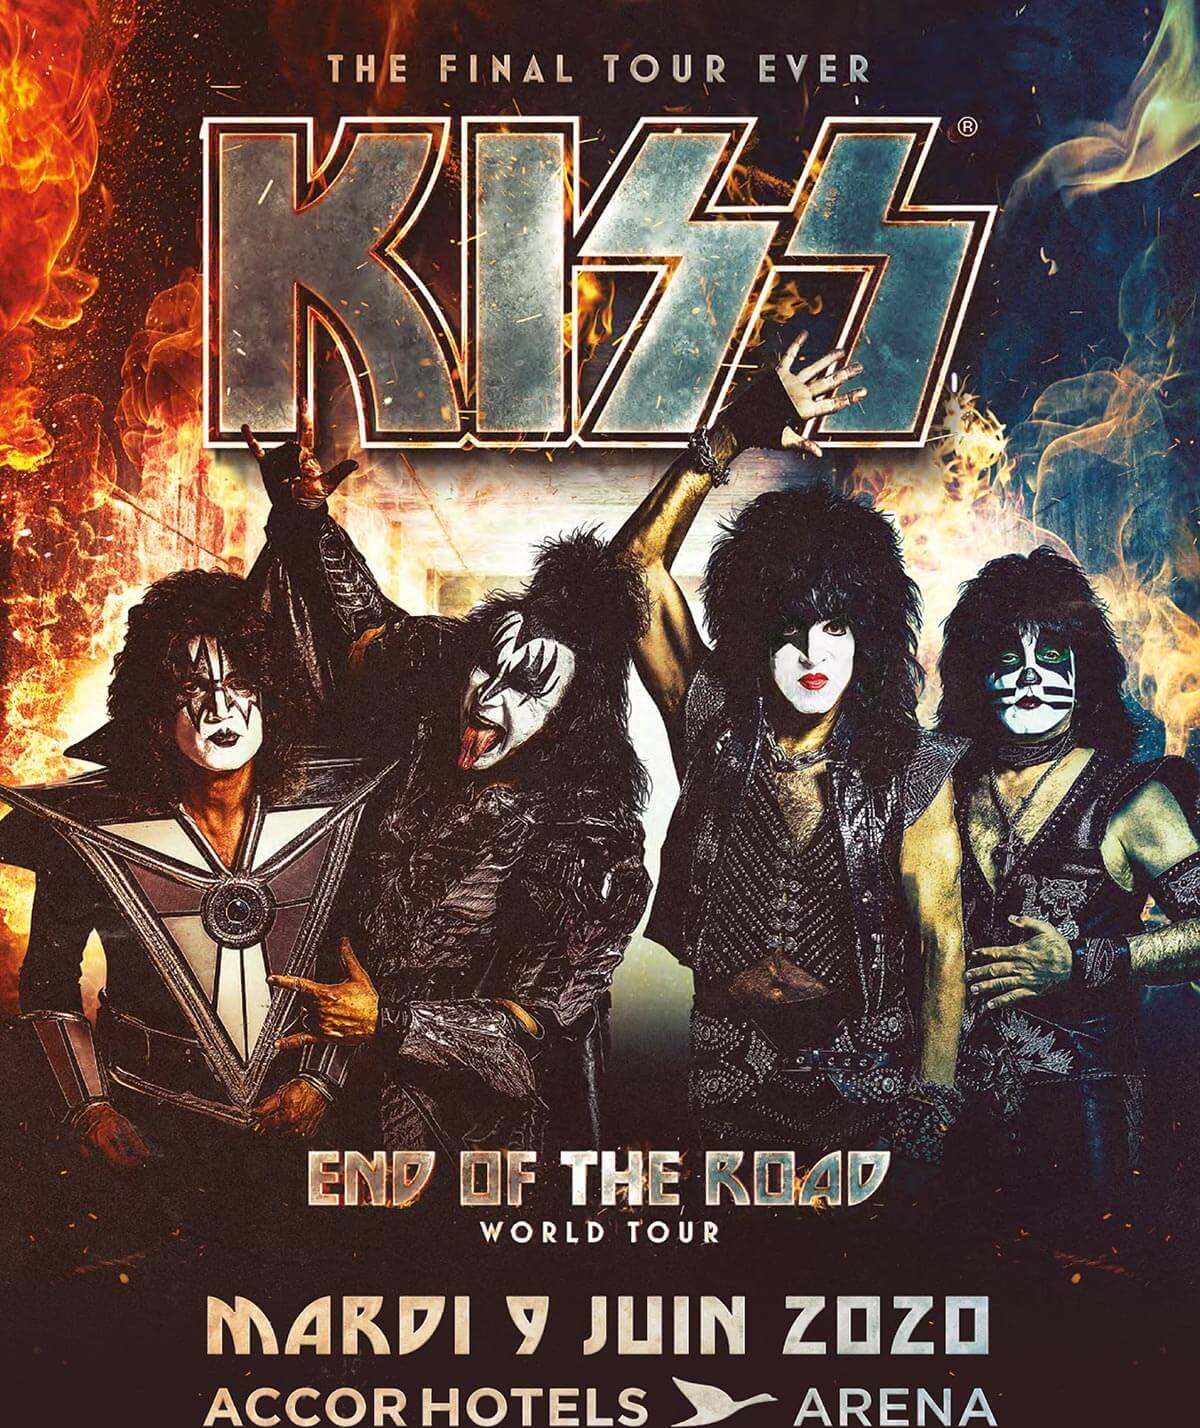 Kiss en concert à l'AccorHotels Arena le 9 juin 2020